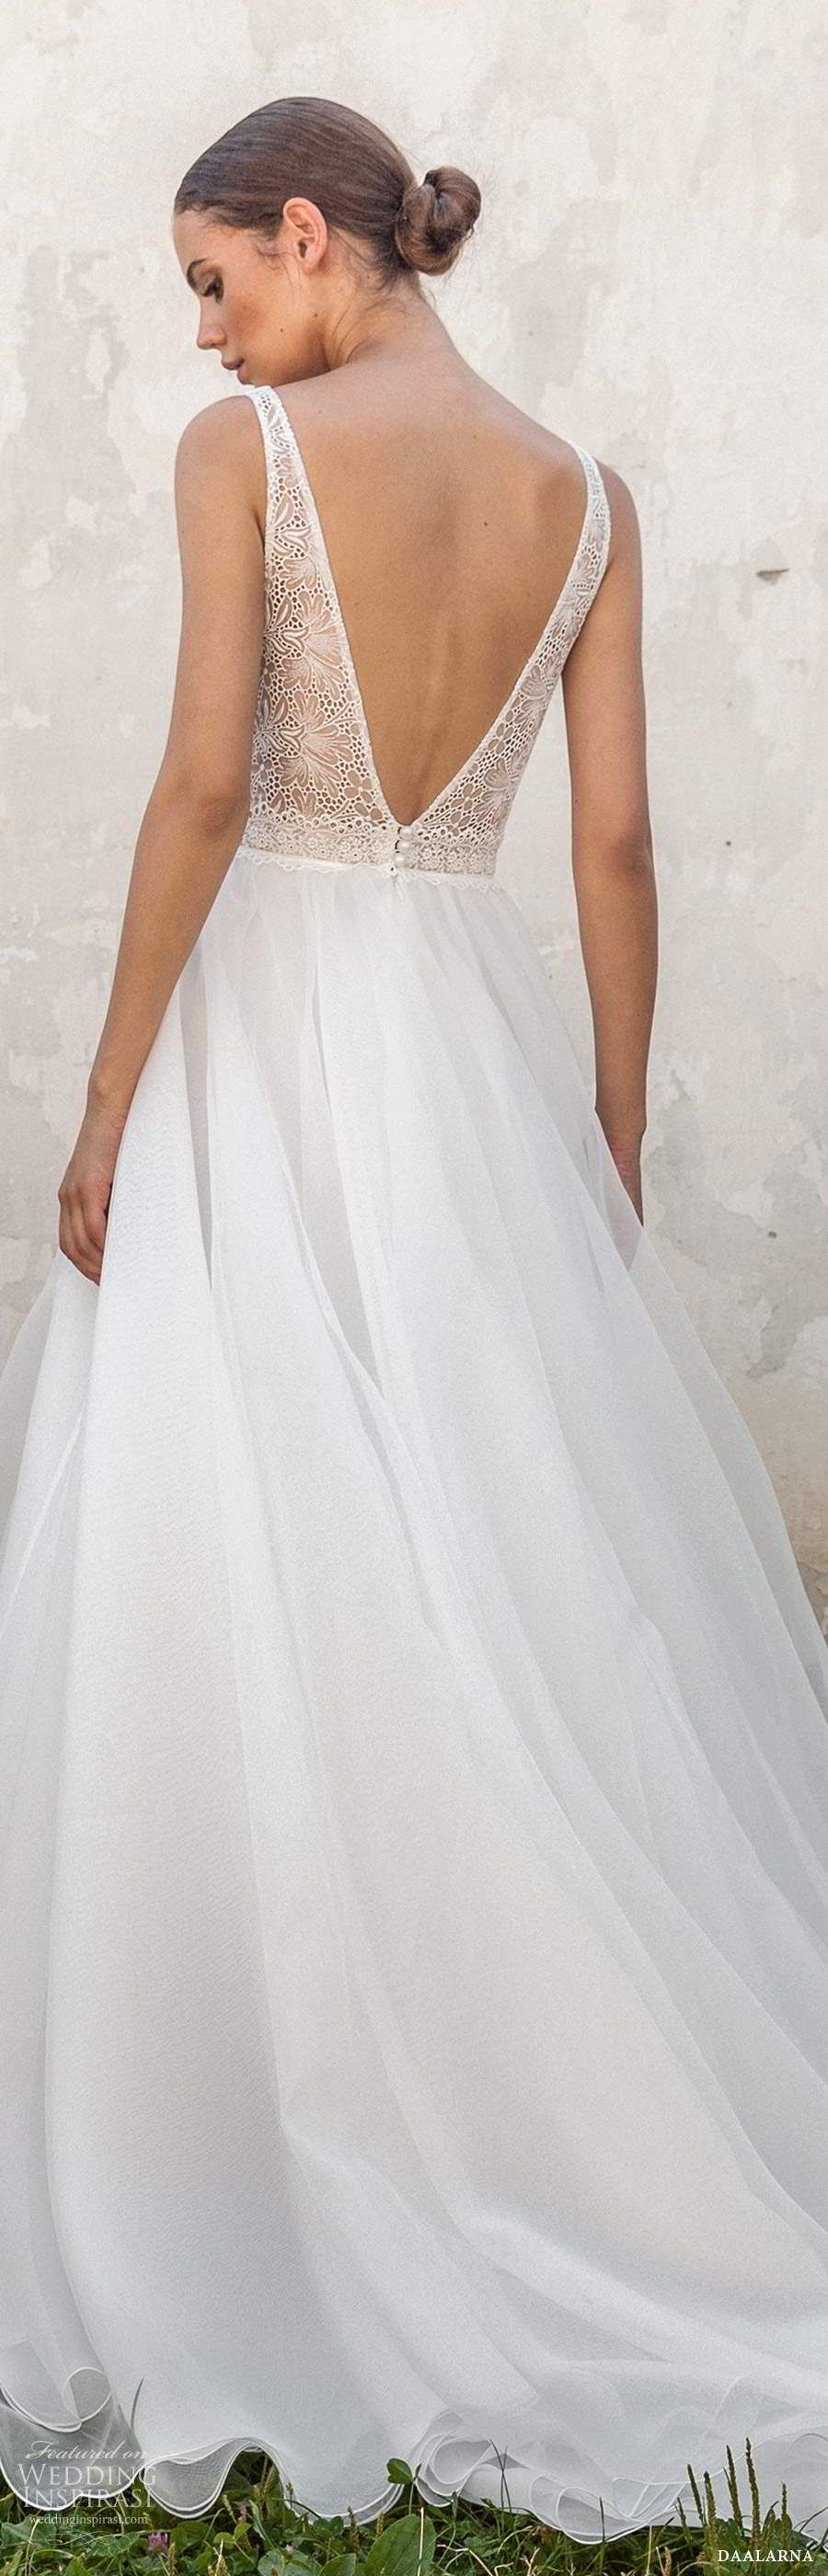 Daalarna Fall 2020 Wedding Dresses Folk Bridal Collection Wedding Inspirasi Wedding Dresses Plus Size Wedding Bridal Collection [ 2800 x 900 Pixel ]